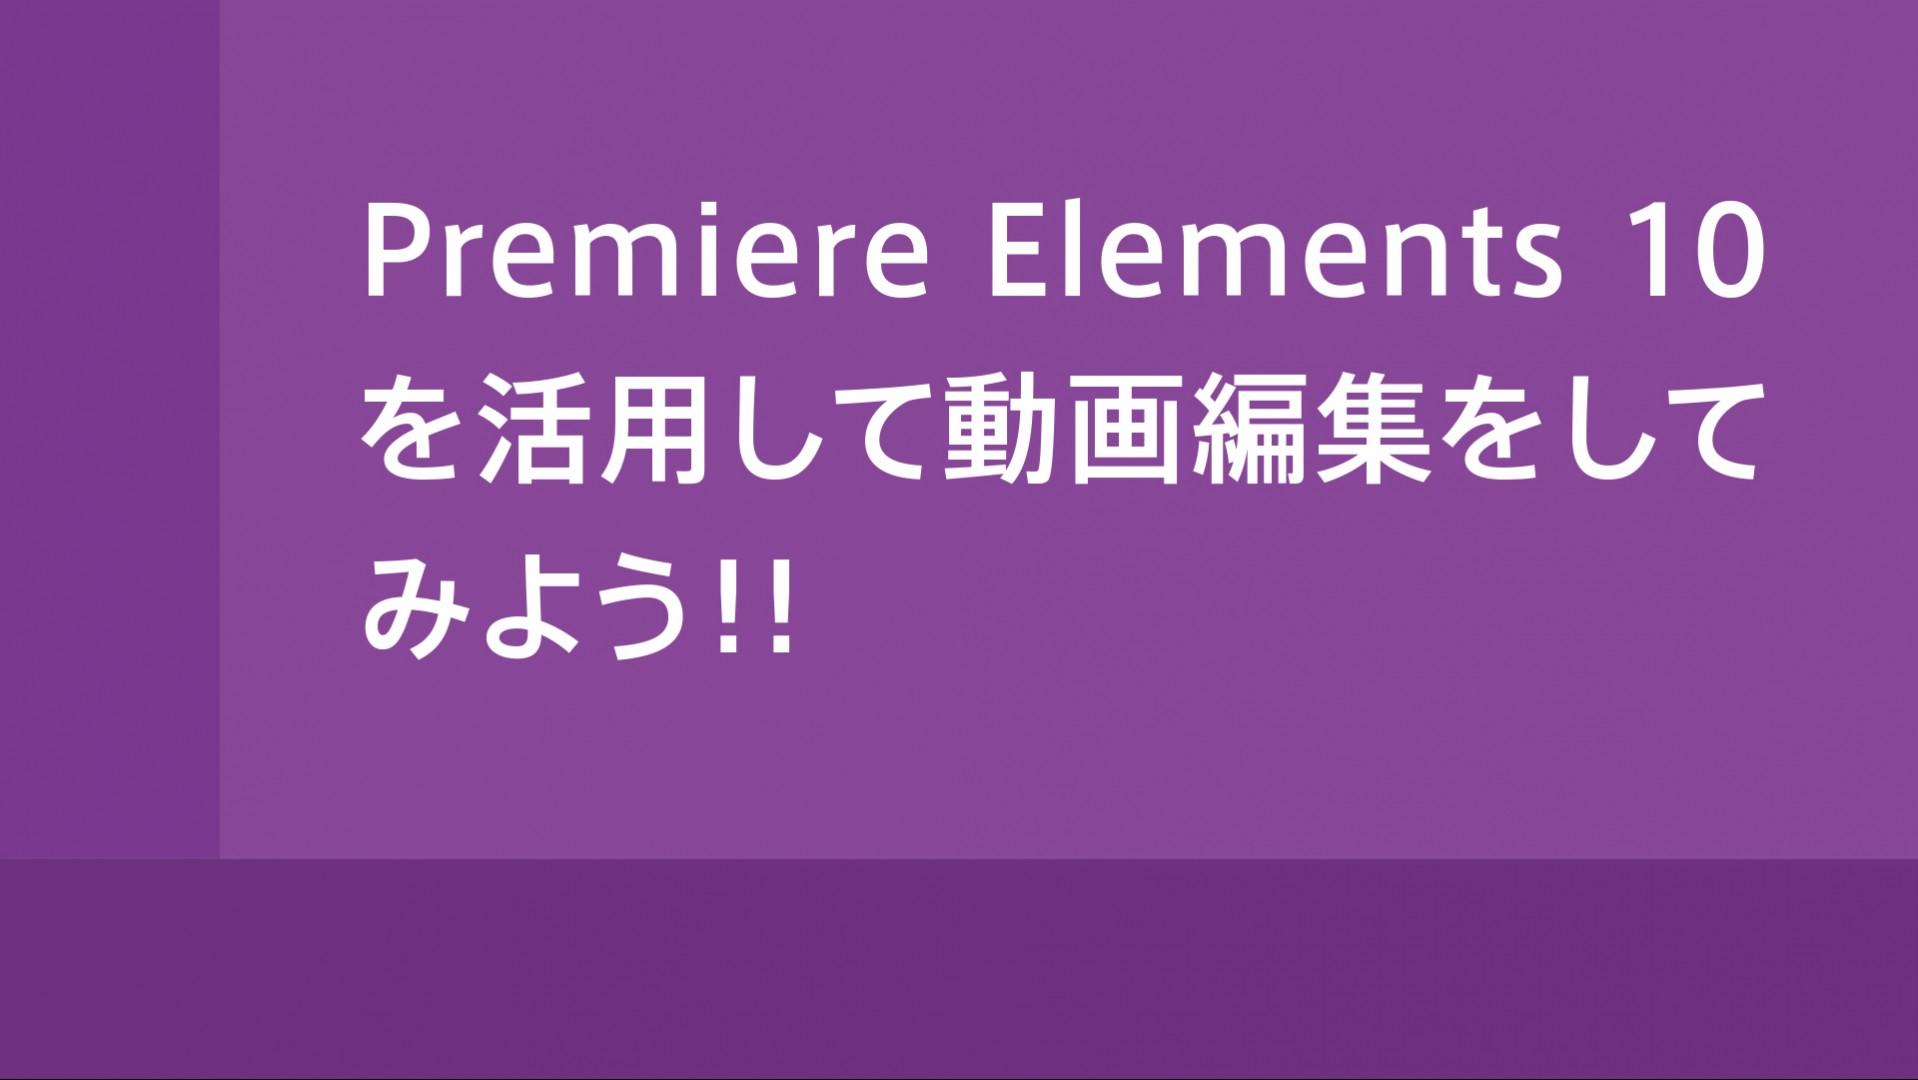 Premiere Elements 10 カラーの調整